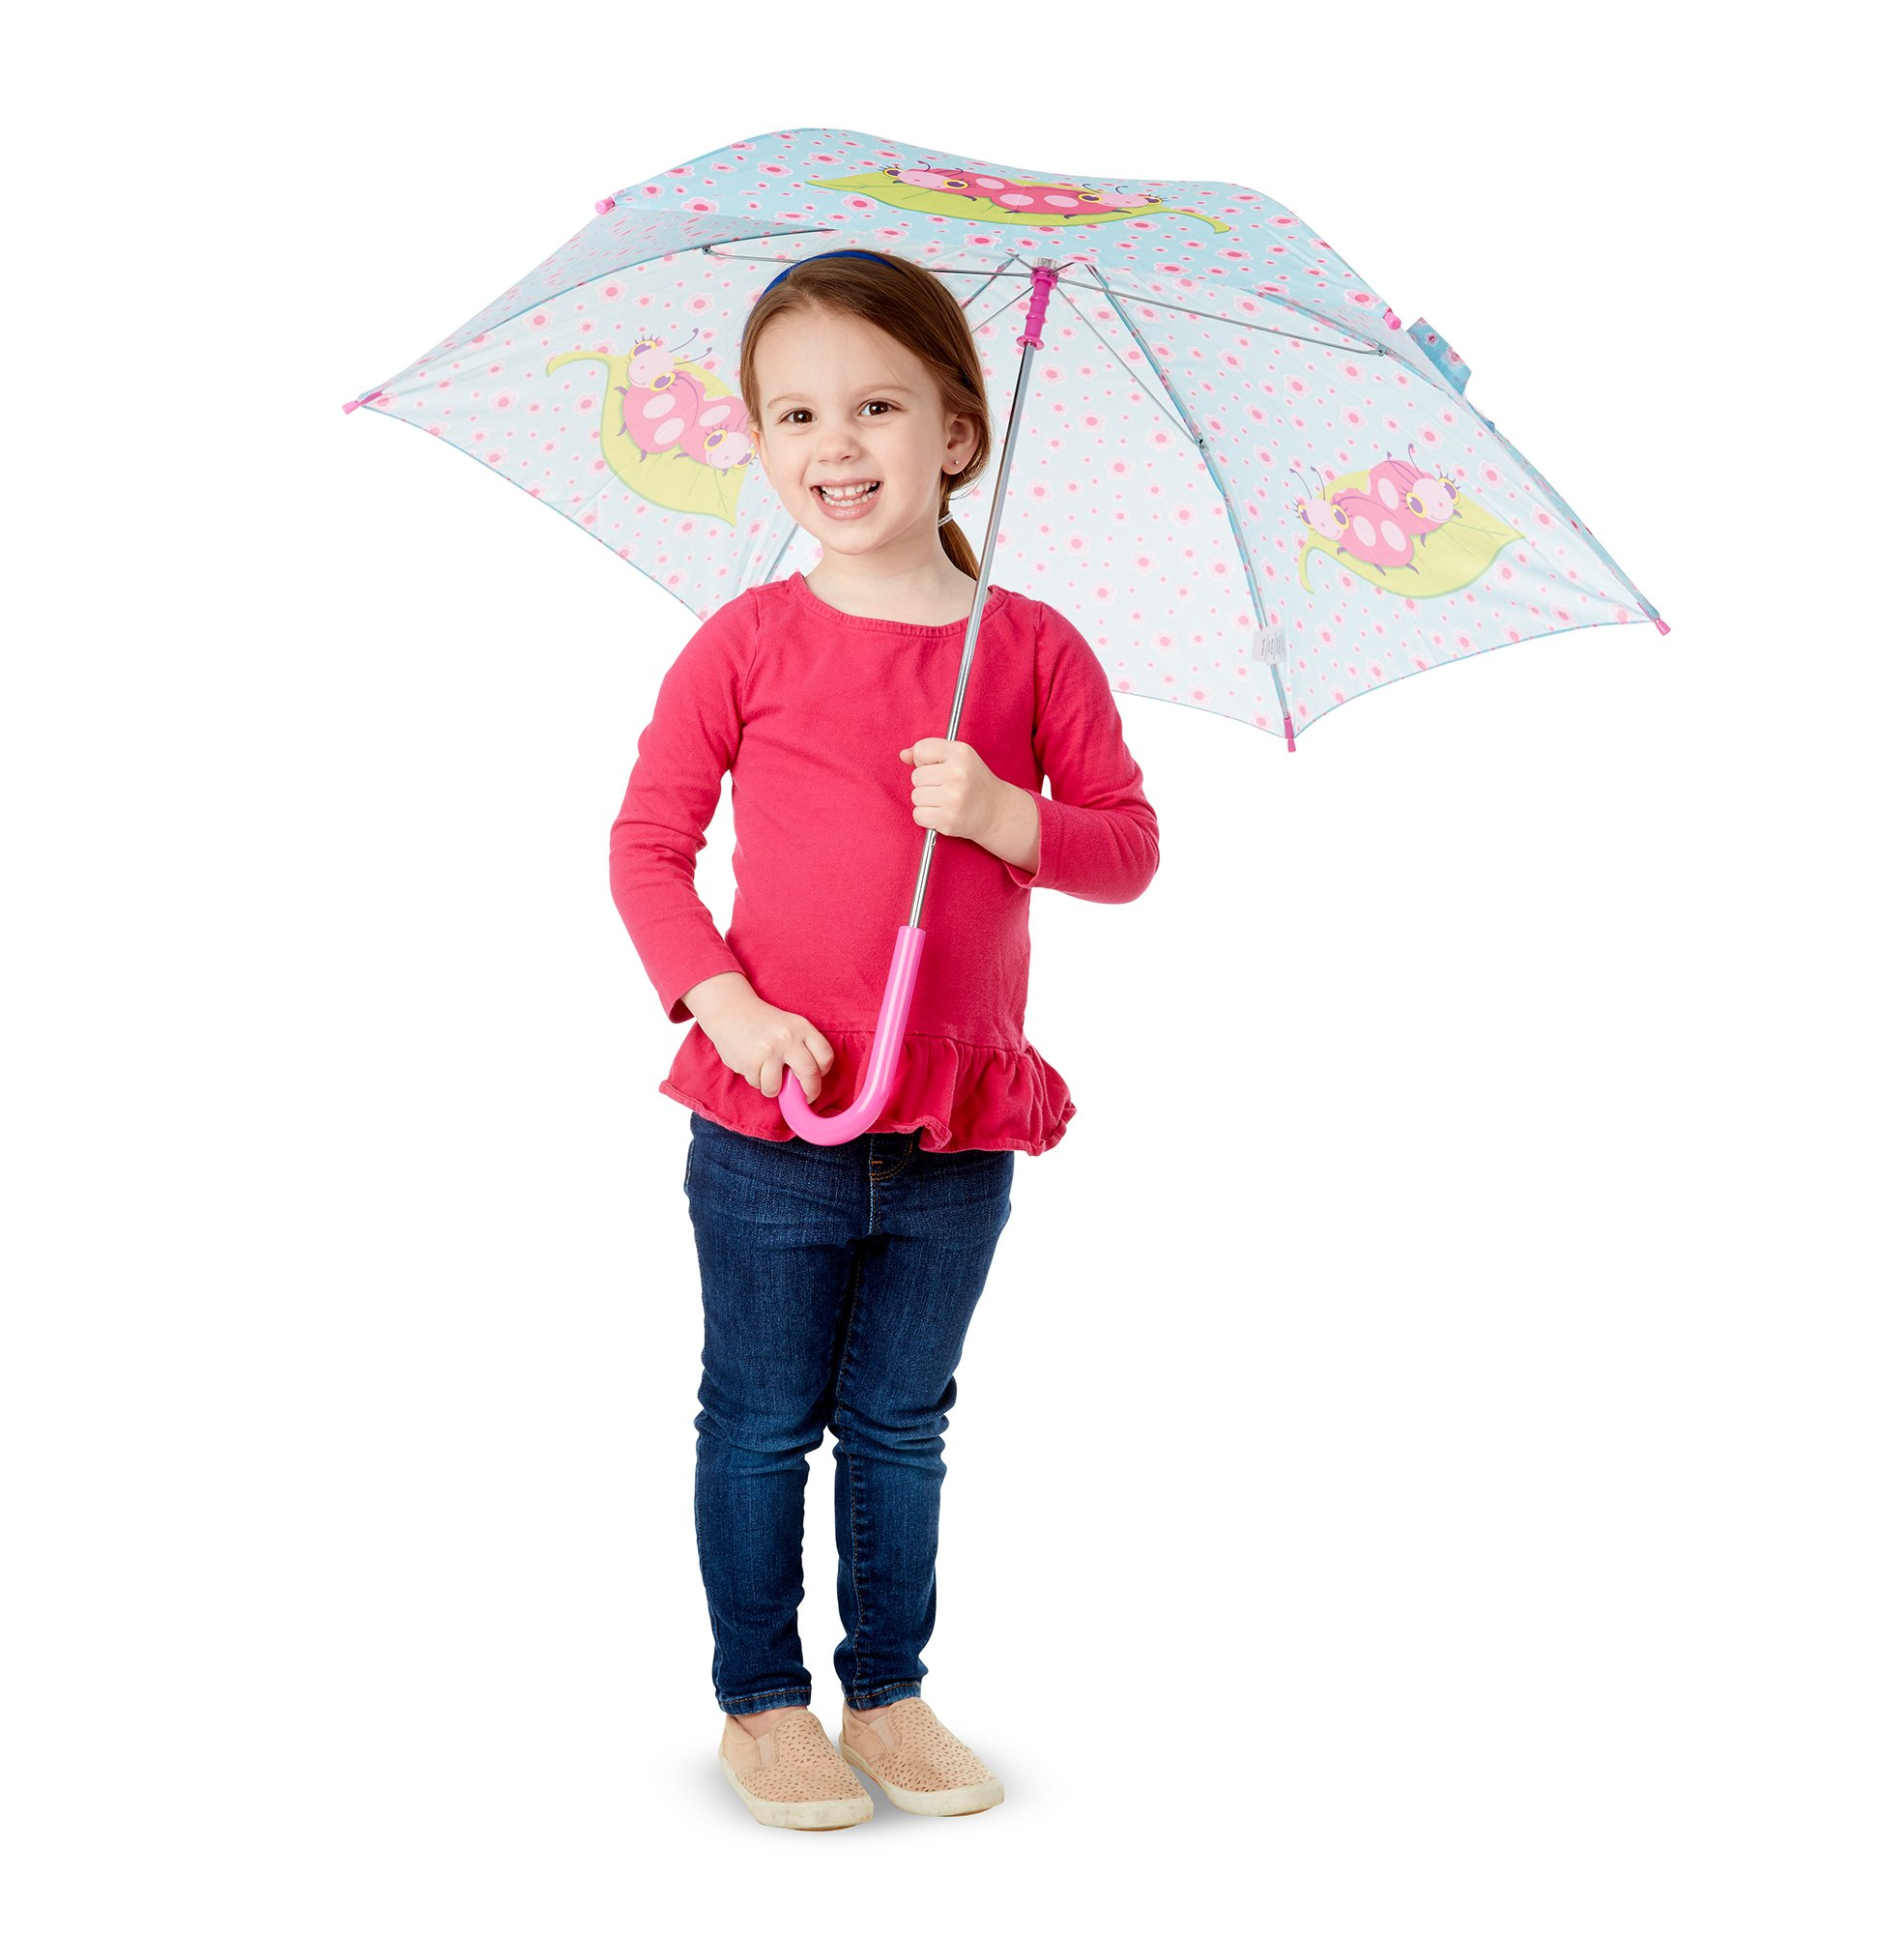 Melissa & Doug Trixie Ladybug Umbrella for Kids With Safety Open and Close by Melissa & Doug (Image #1)